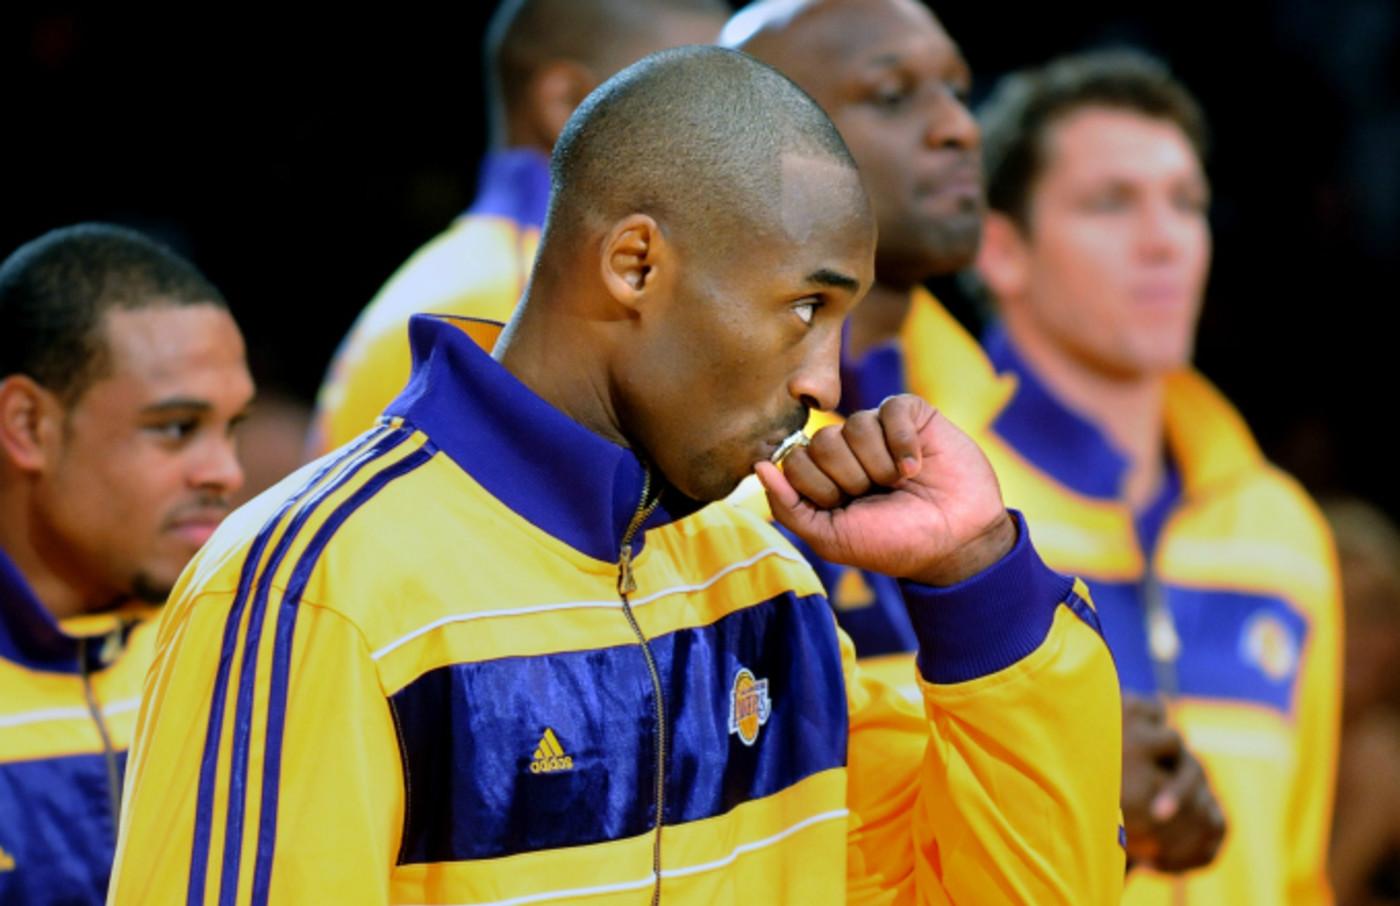 Lakers Kobe Bryant kisses his championship ring